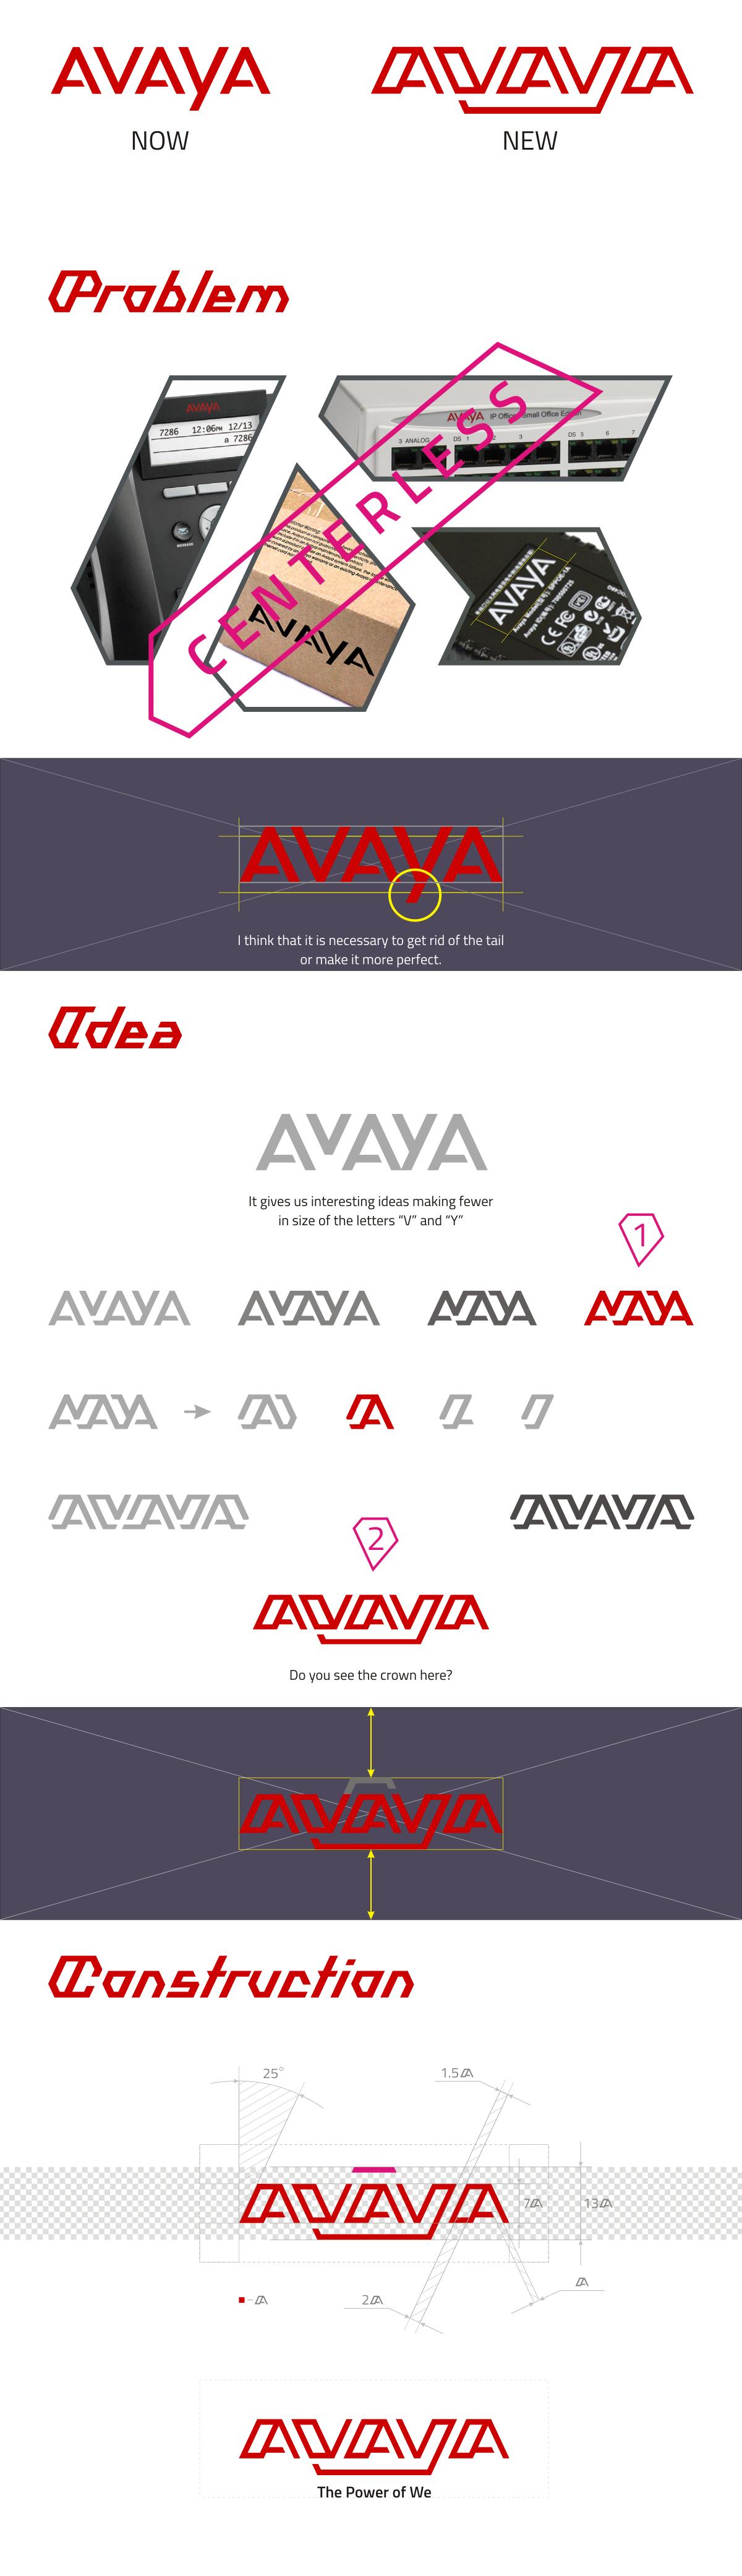 avaya logo redesign for fun